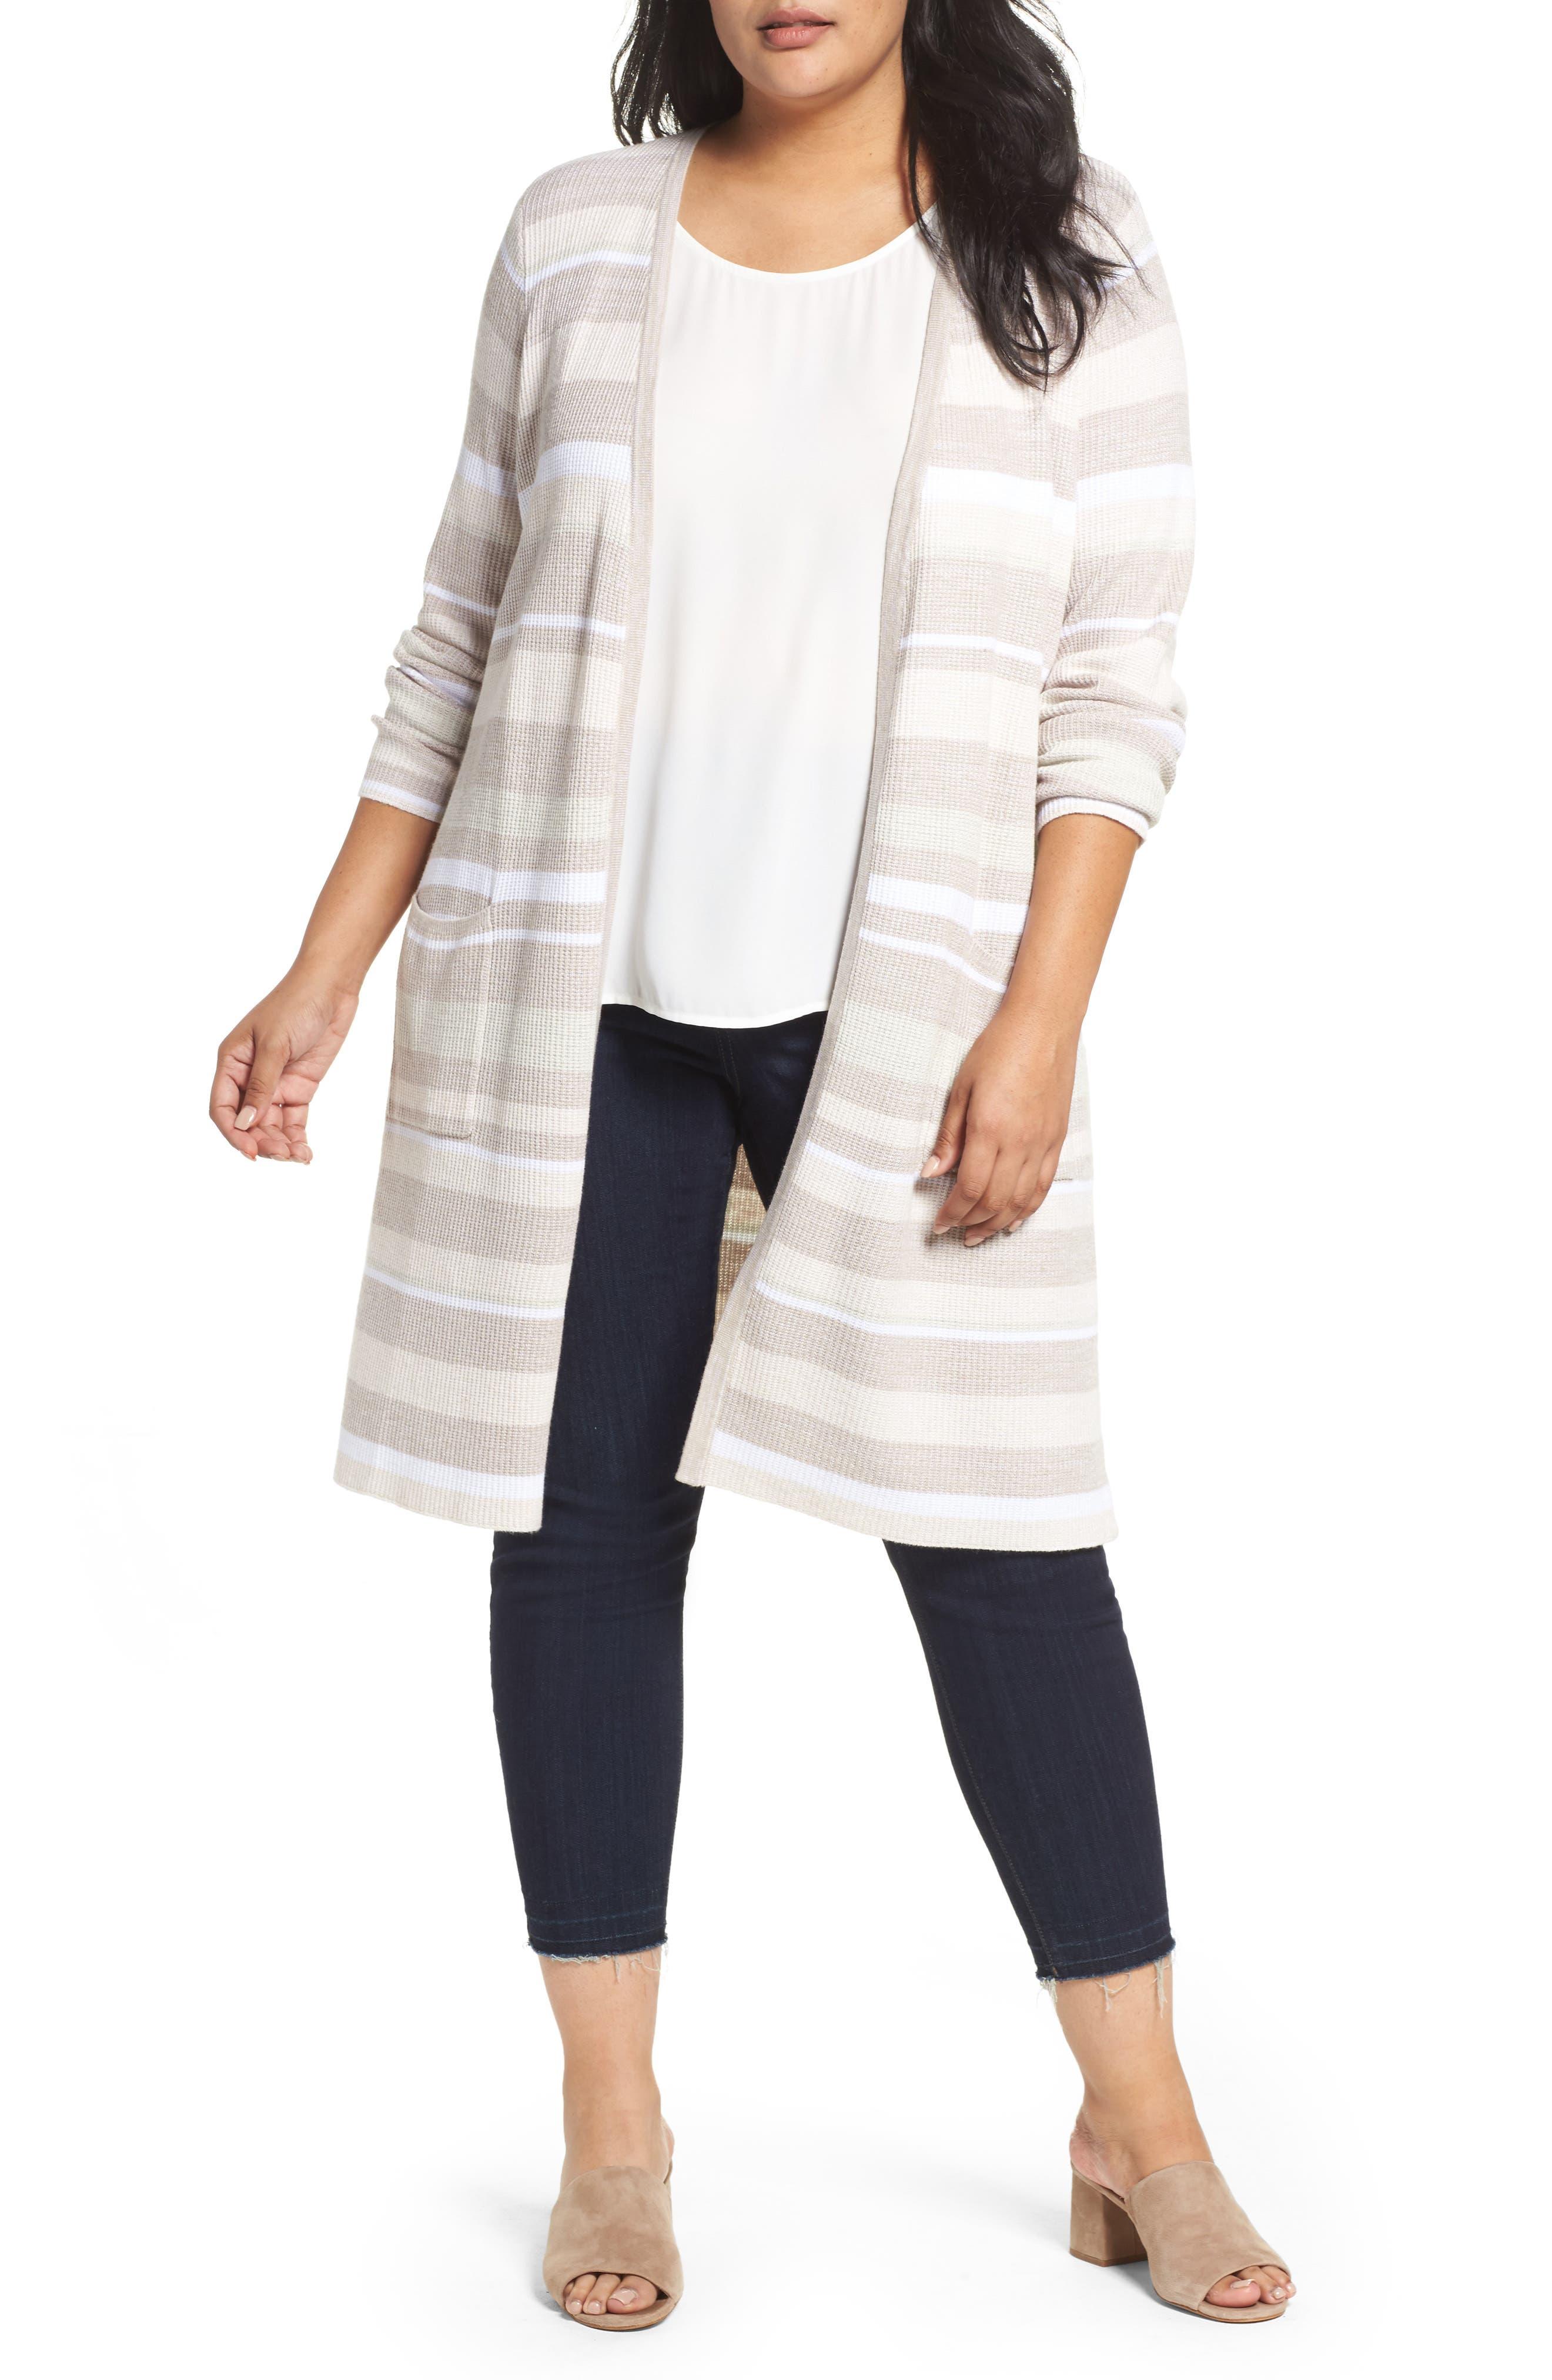 Alternate Image 1 Selected - Foxcroft Rhona Textured Stripe Longline Cardigan (Plus Size)